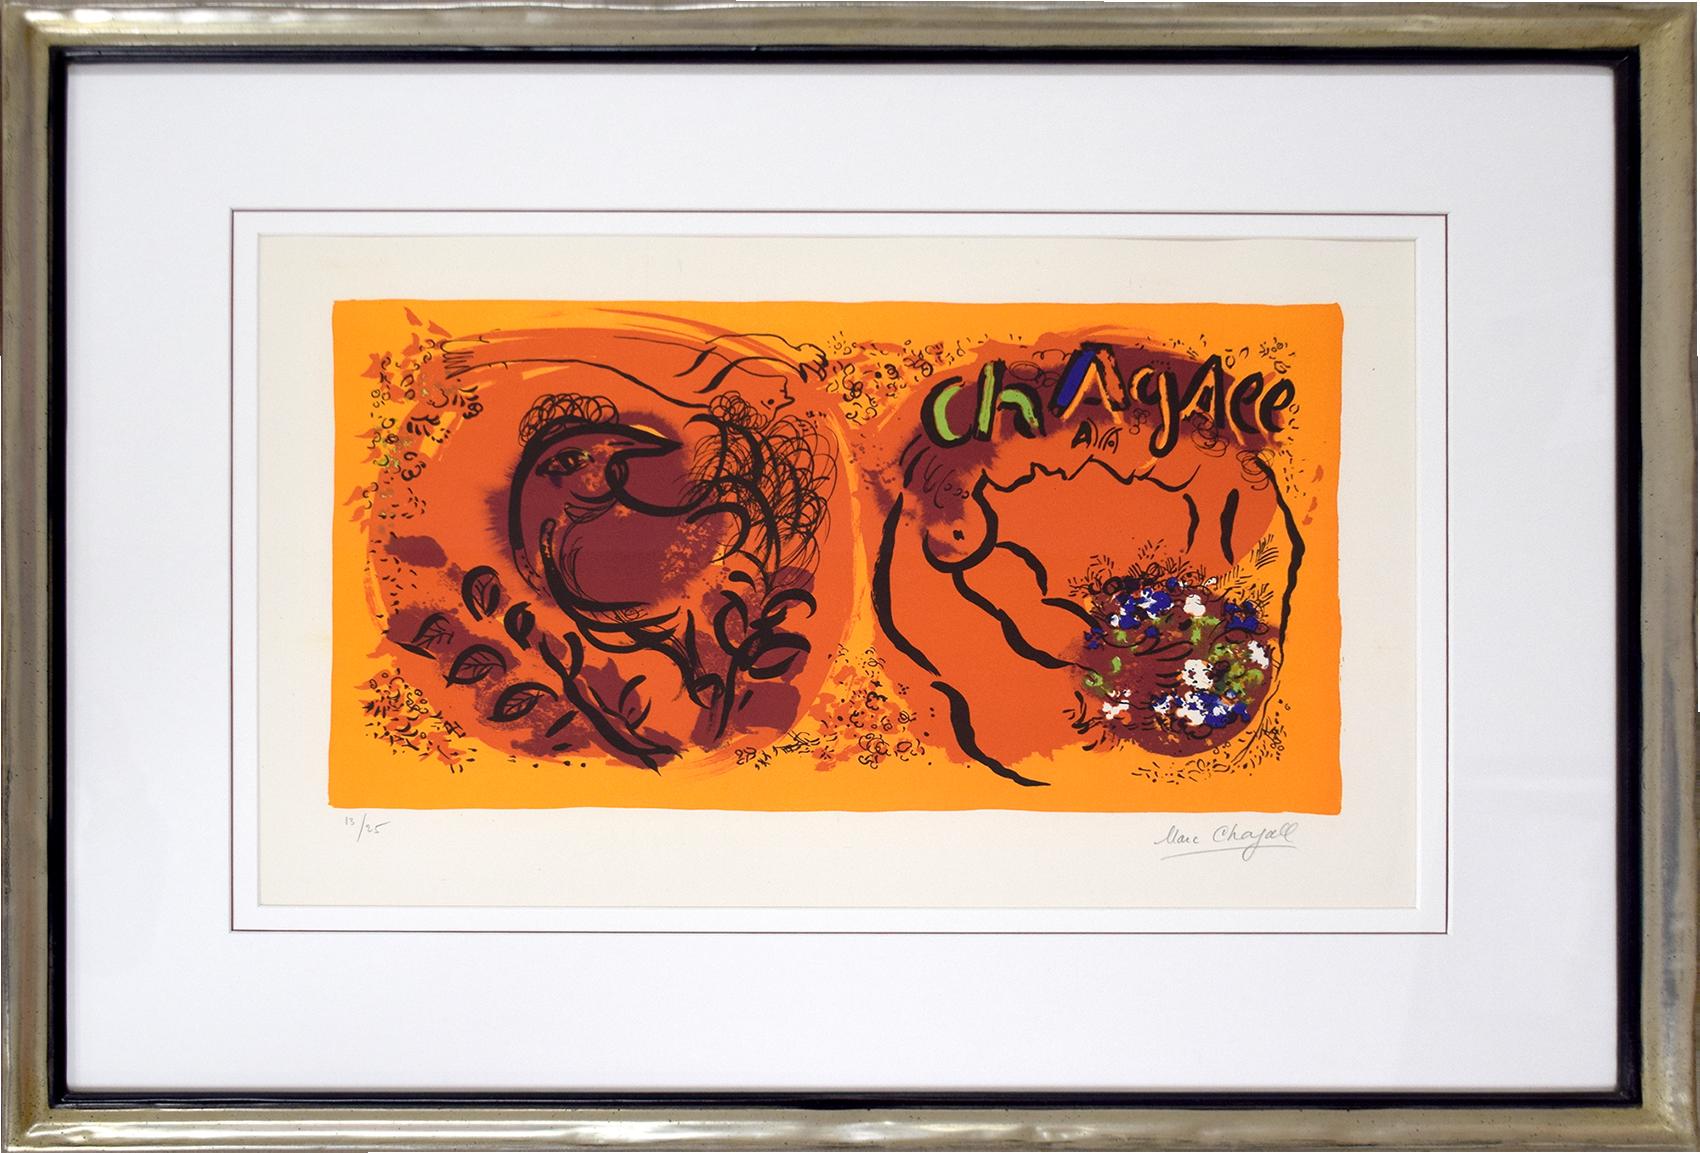 Marc Chagall - Couverture Jaquette , 0610-008-485